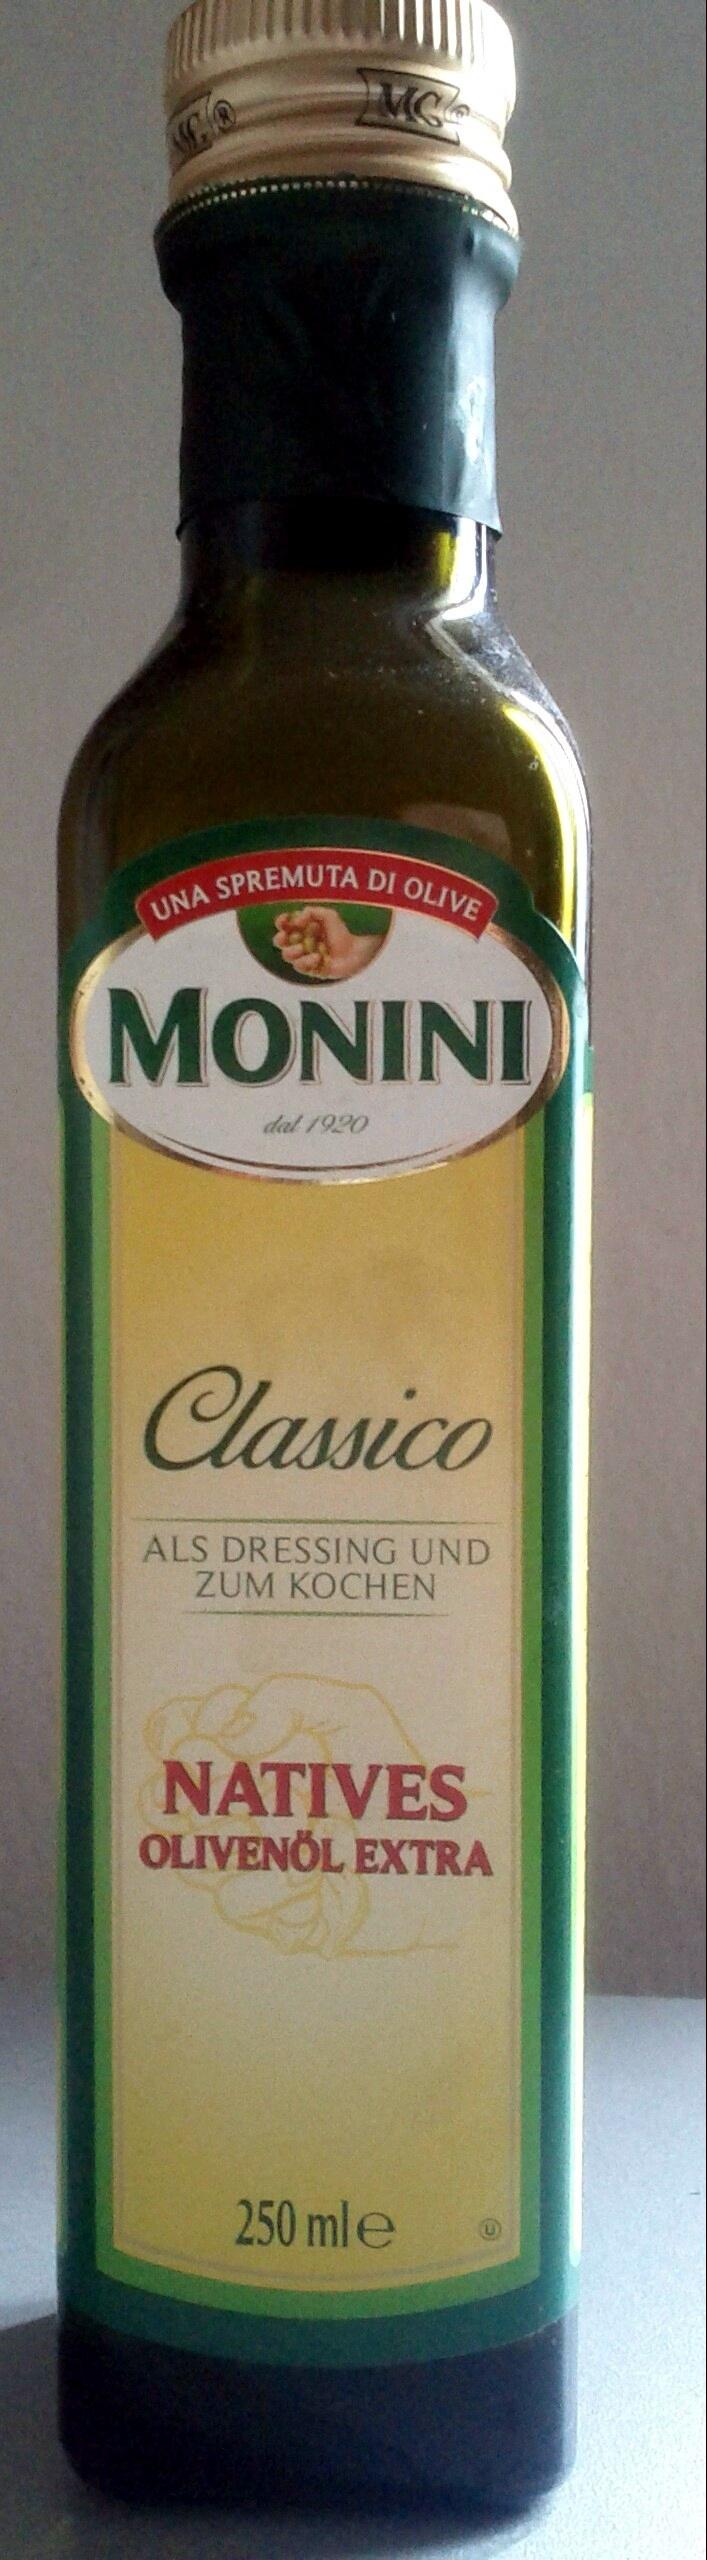 Monini Natives Olivenöl Extra - Product